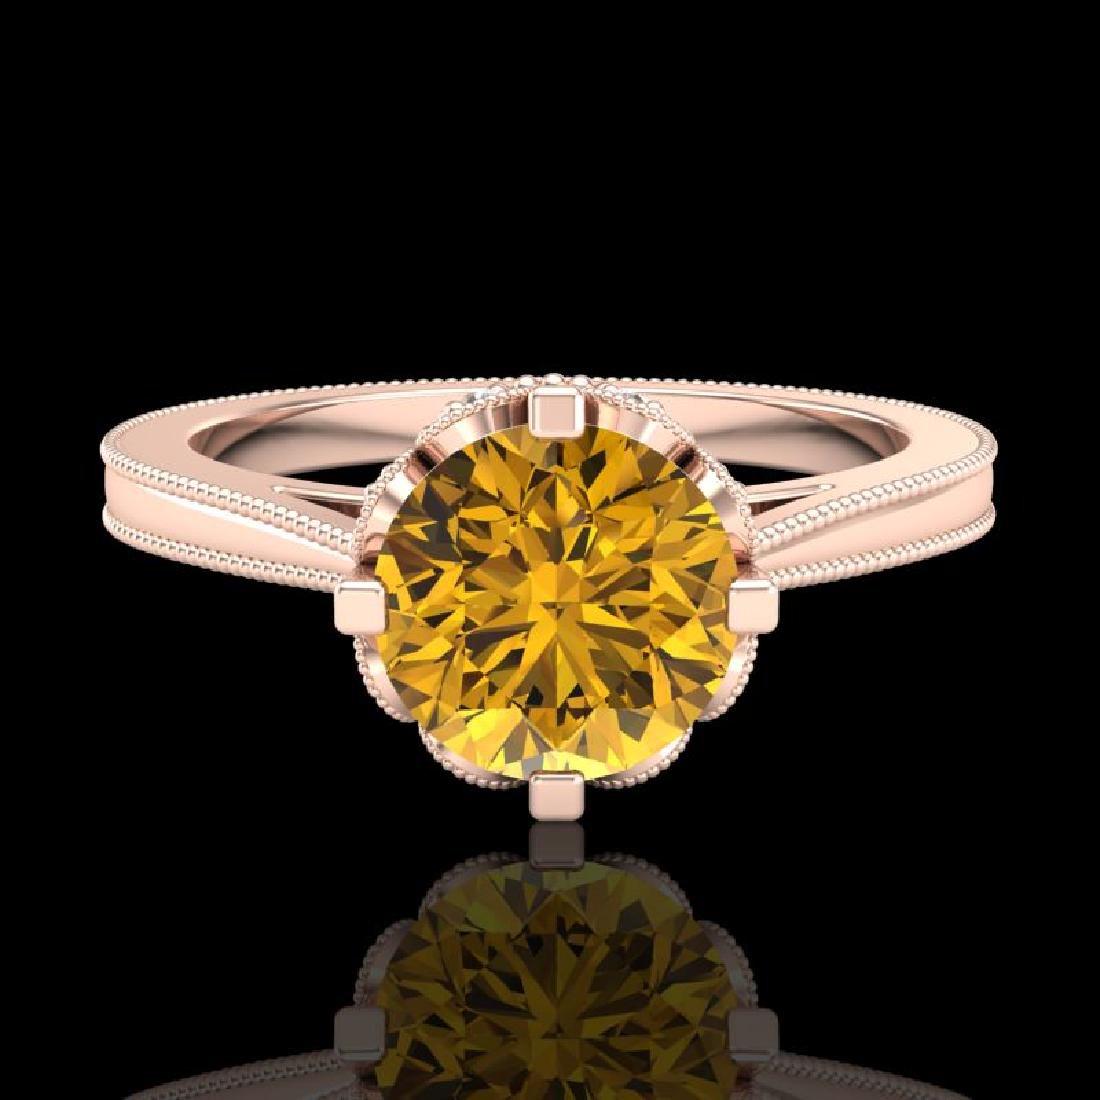 1.5 CTW Intense Fancy Yellow Diamond Engagement Art - 2